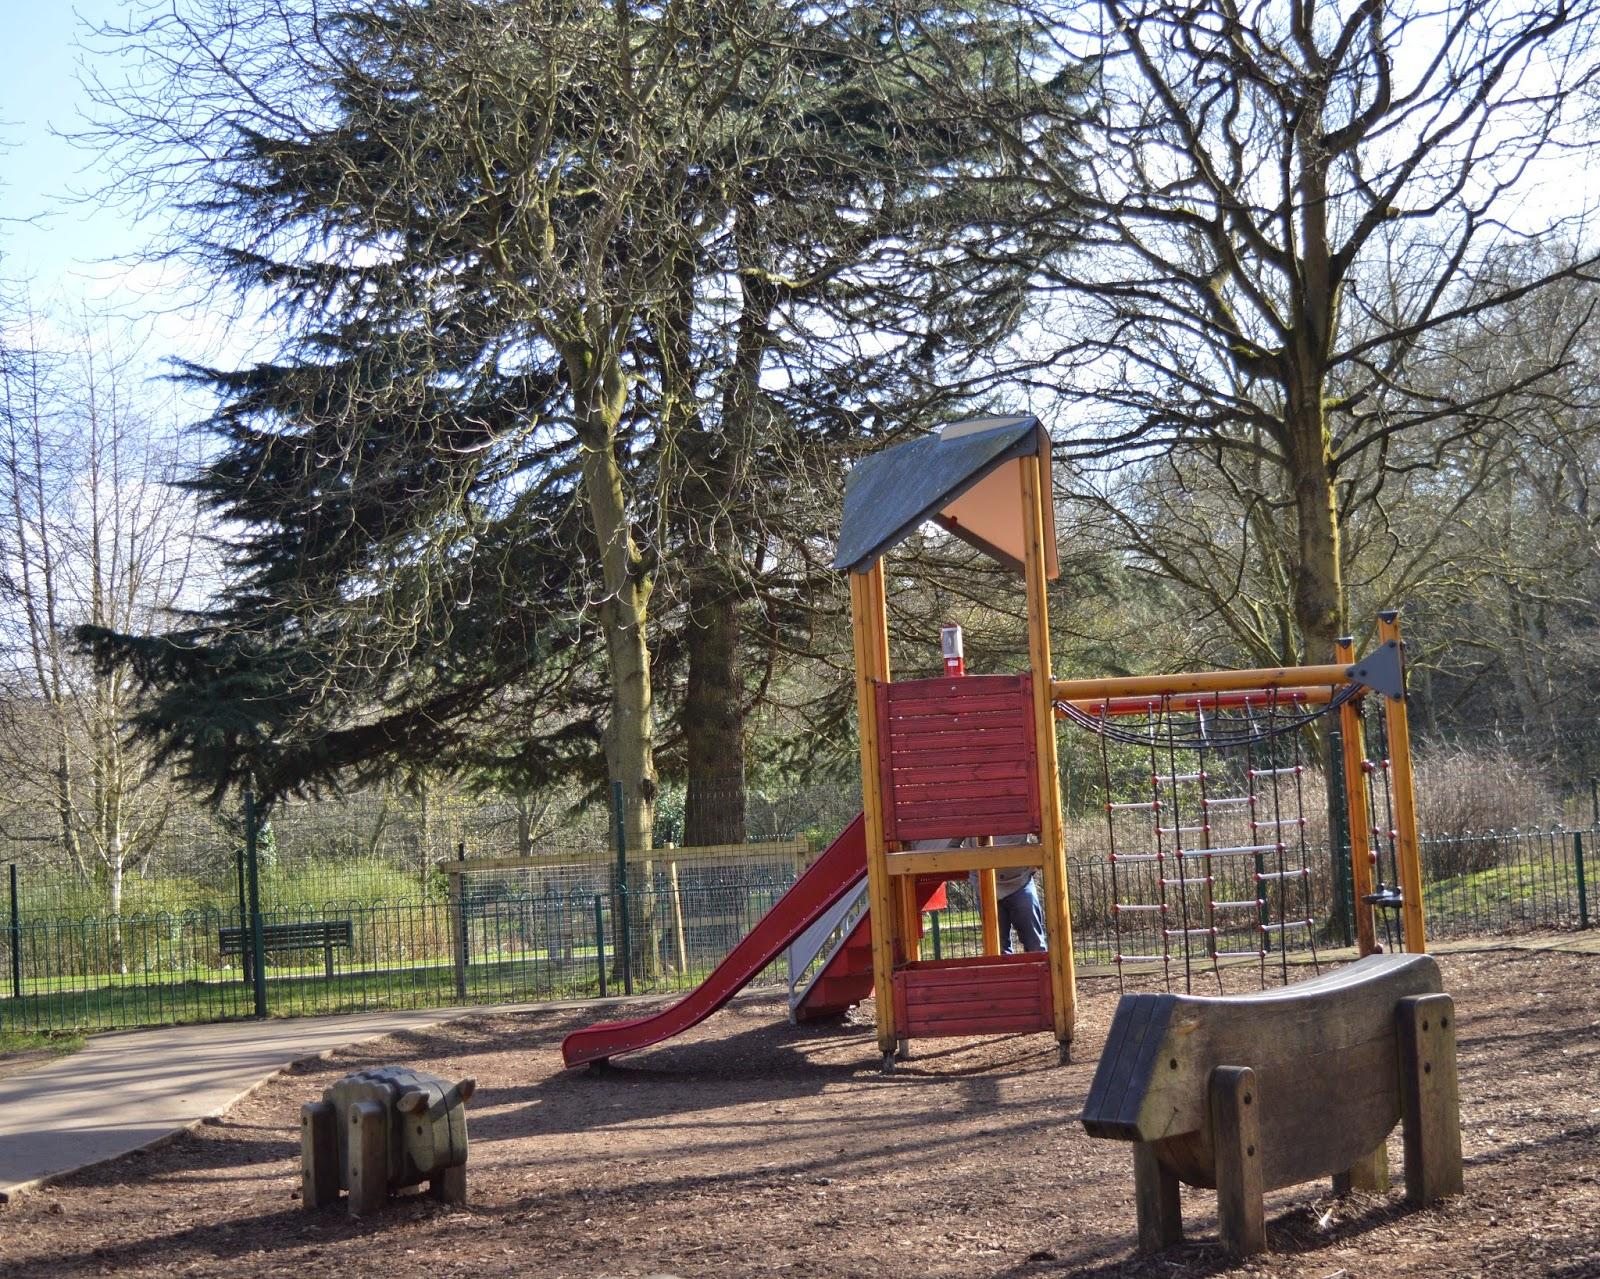 10+ Free Things To Do In Newcastle Upon Tyne - Jesmond Dene Park